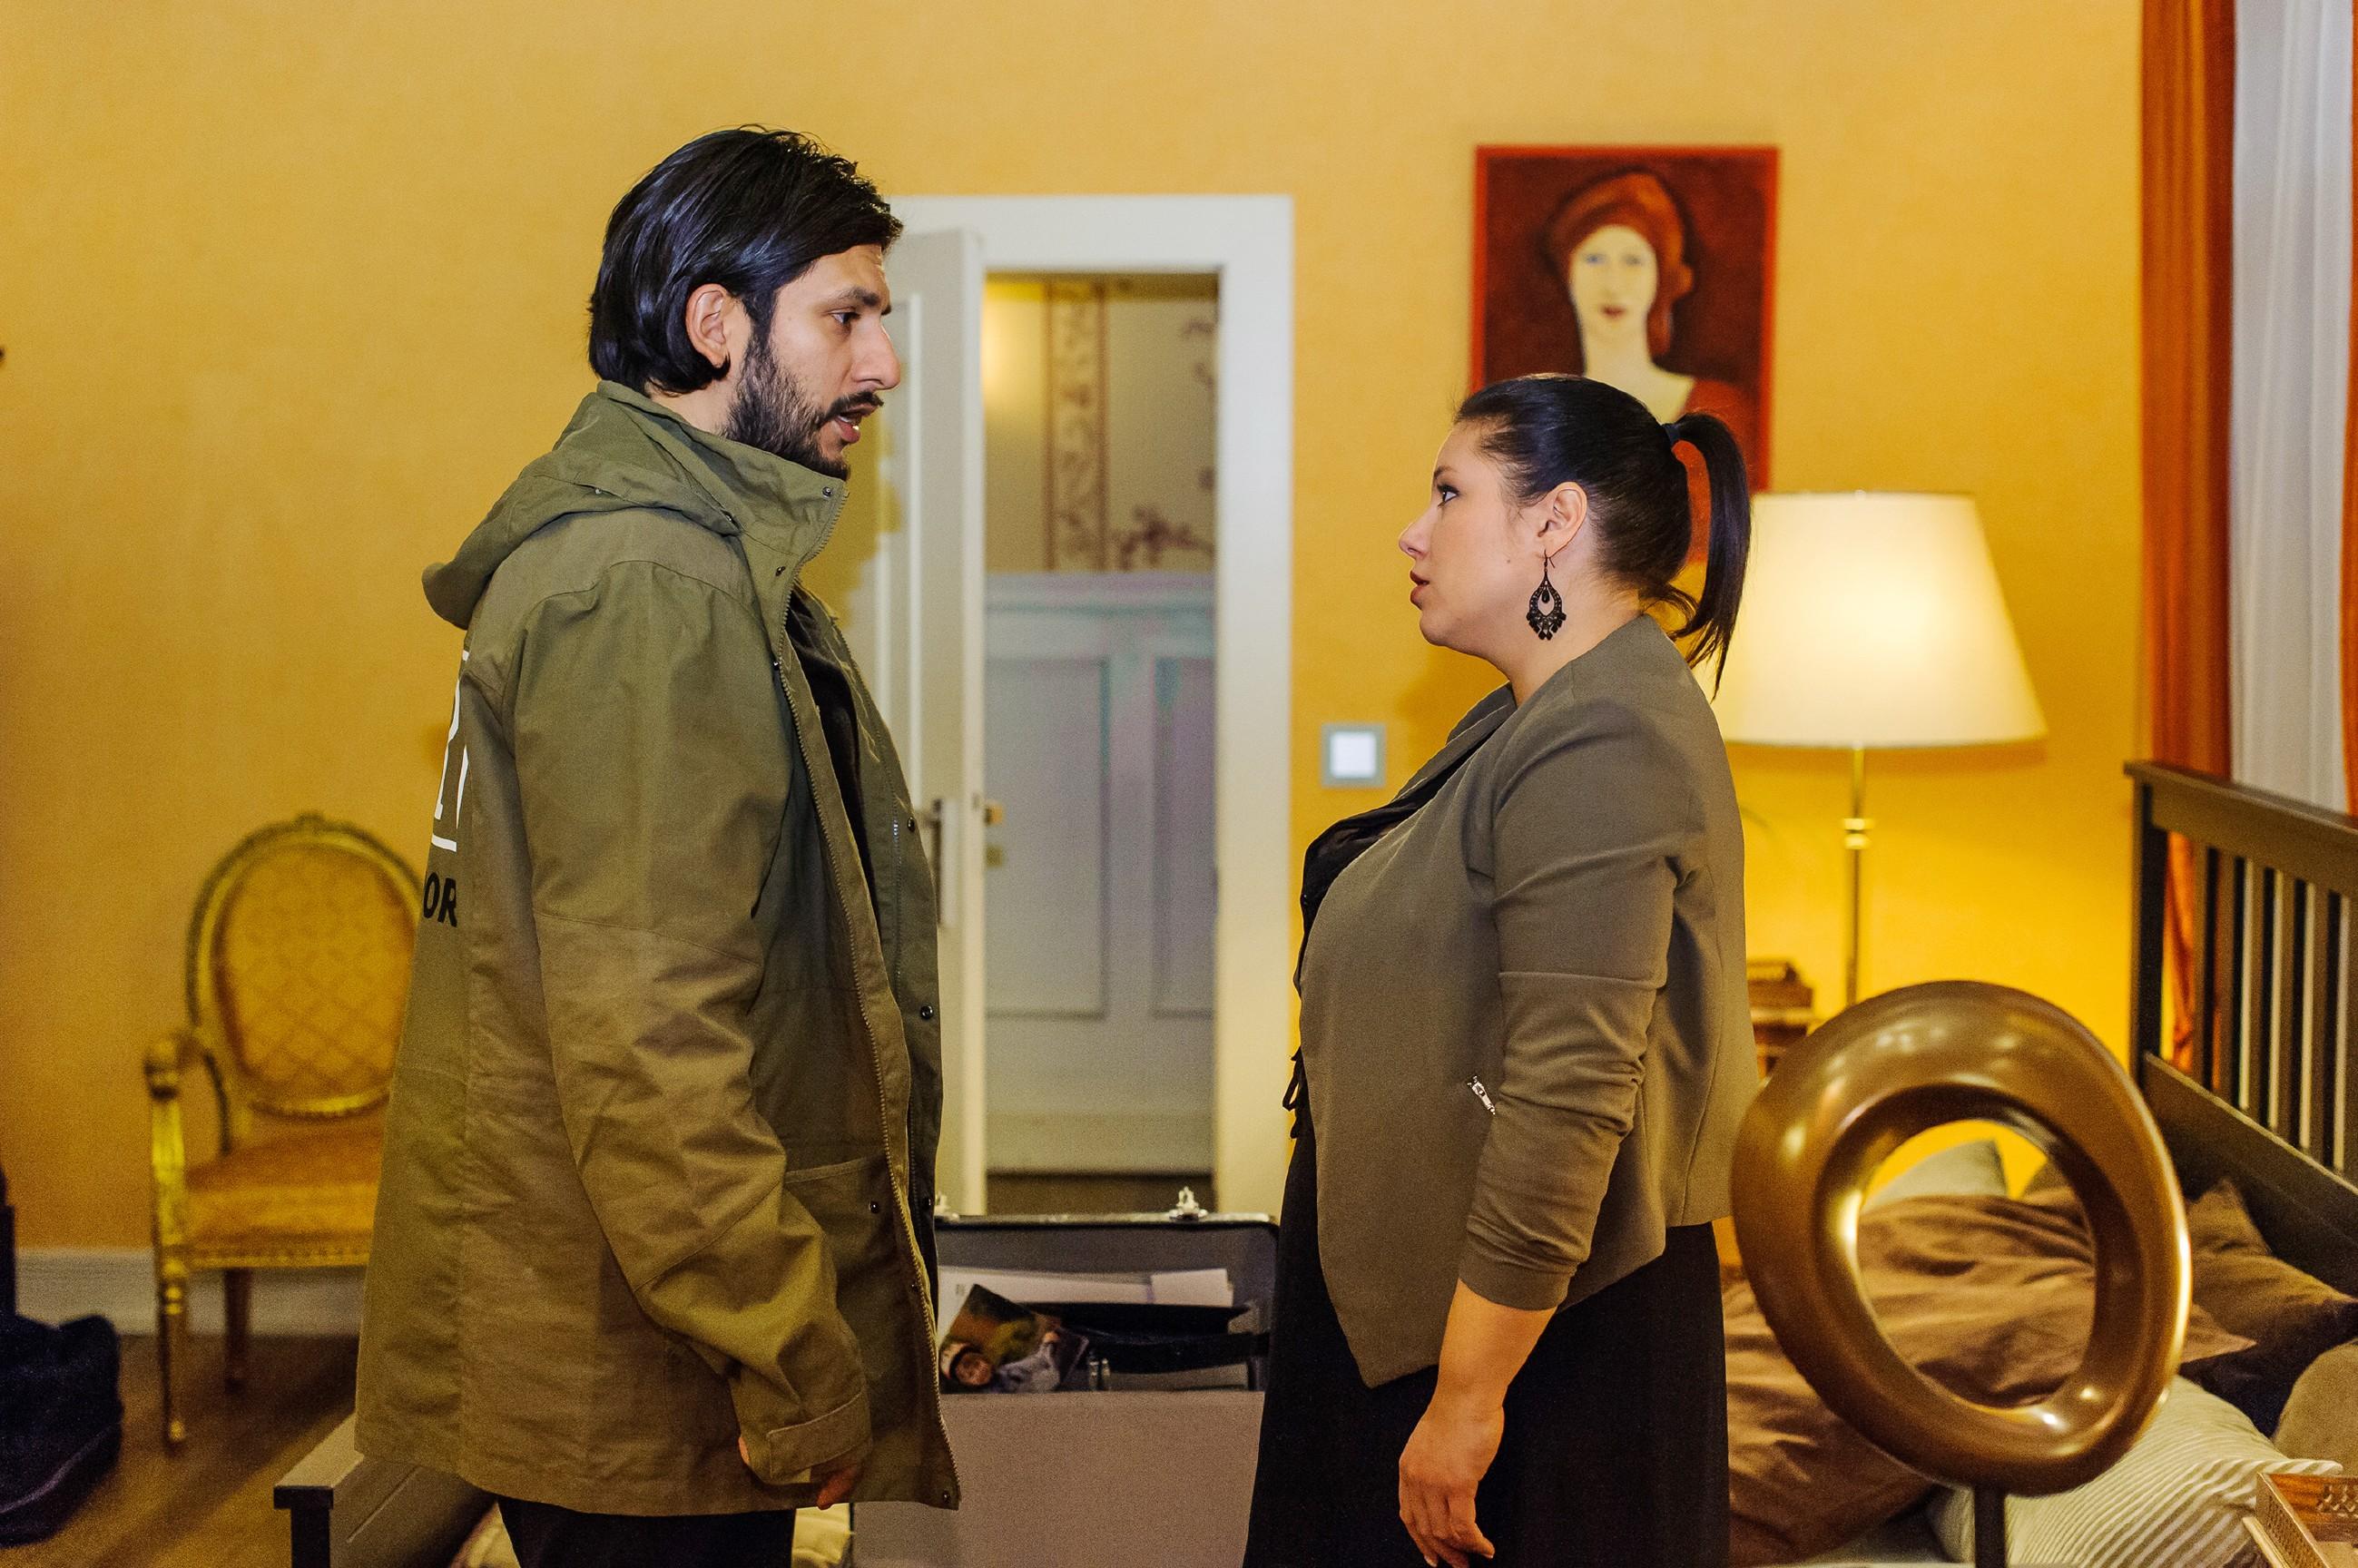 Maximilian (Francisco Medina) fliegt vor Vanessa (Julia Augustin) auf... (Quelle: RTL / Julia Feldhagen)